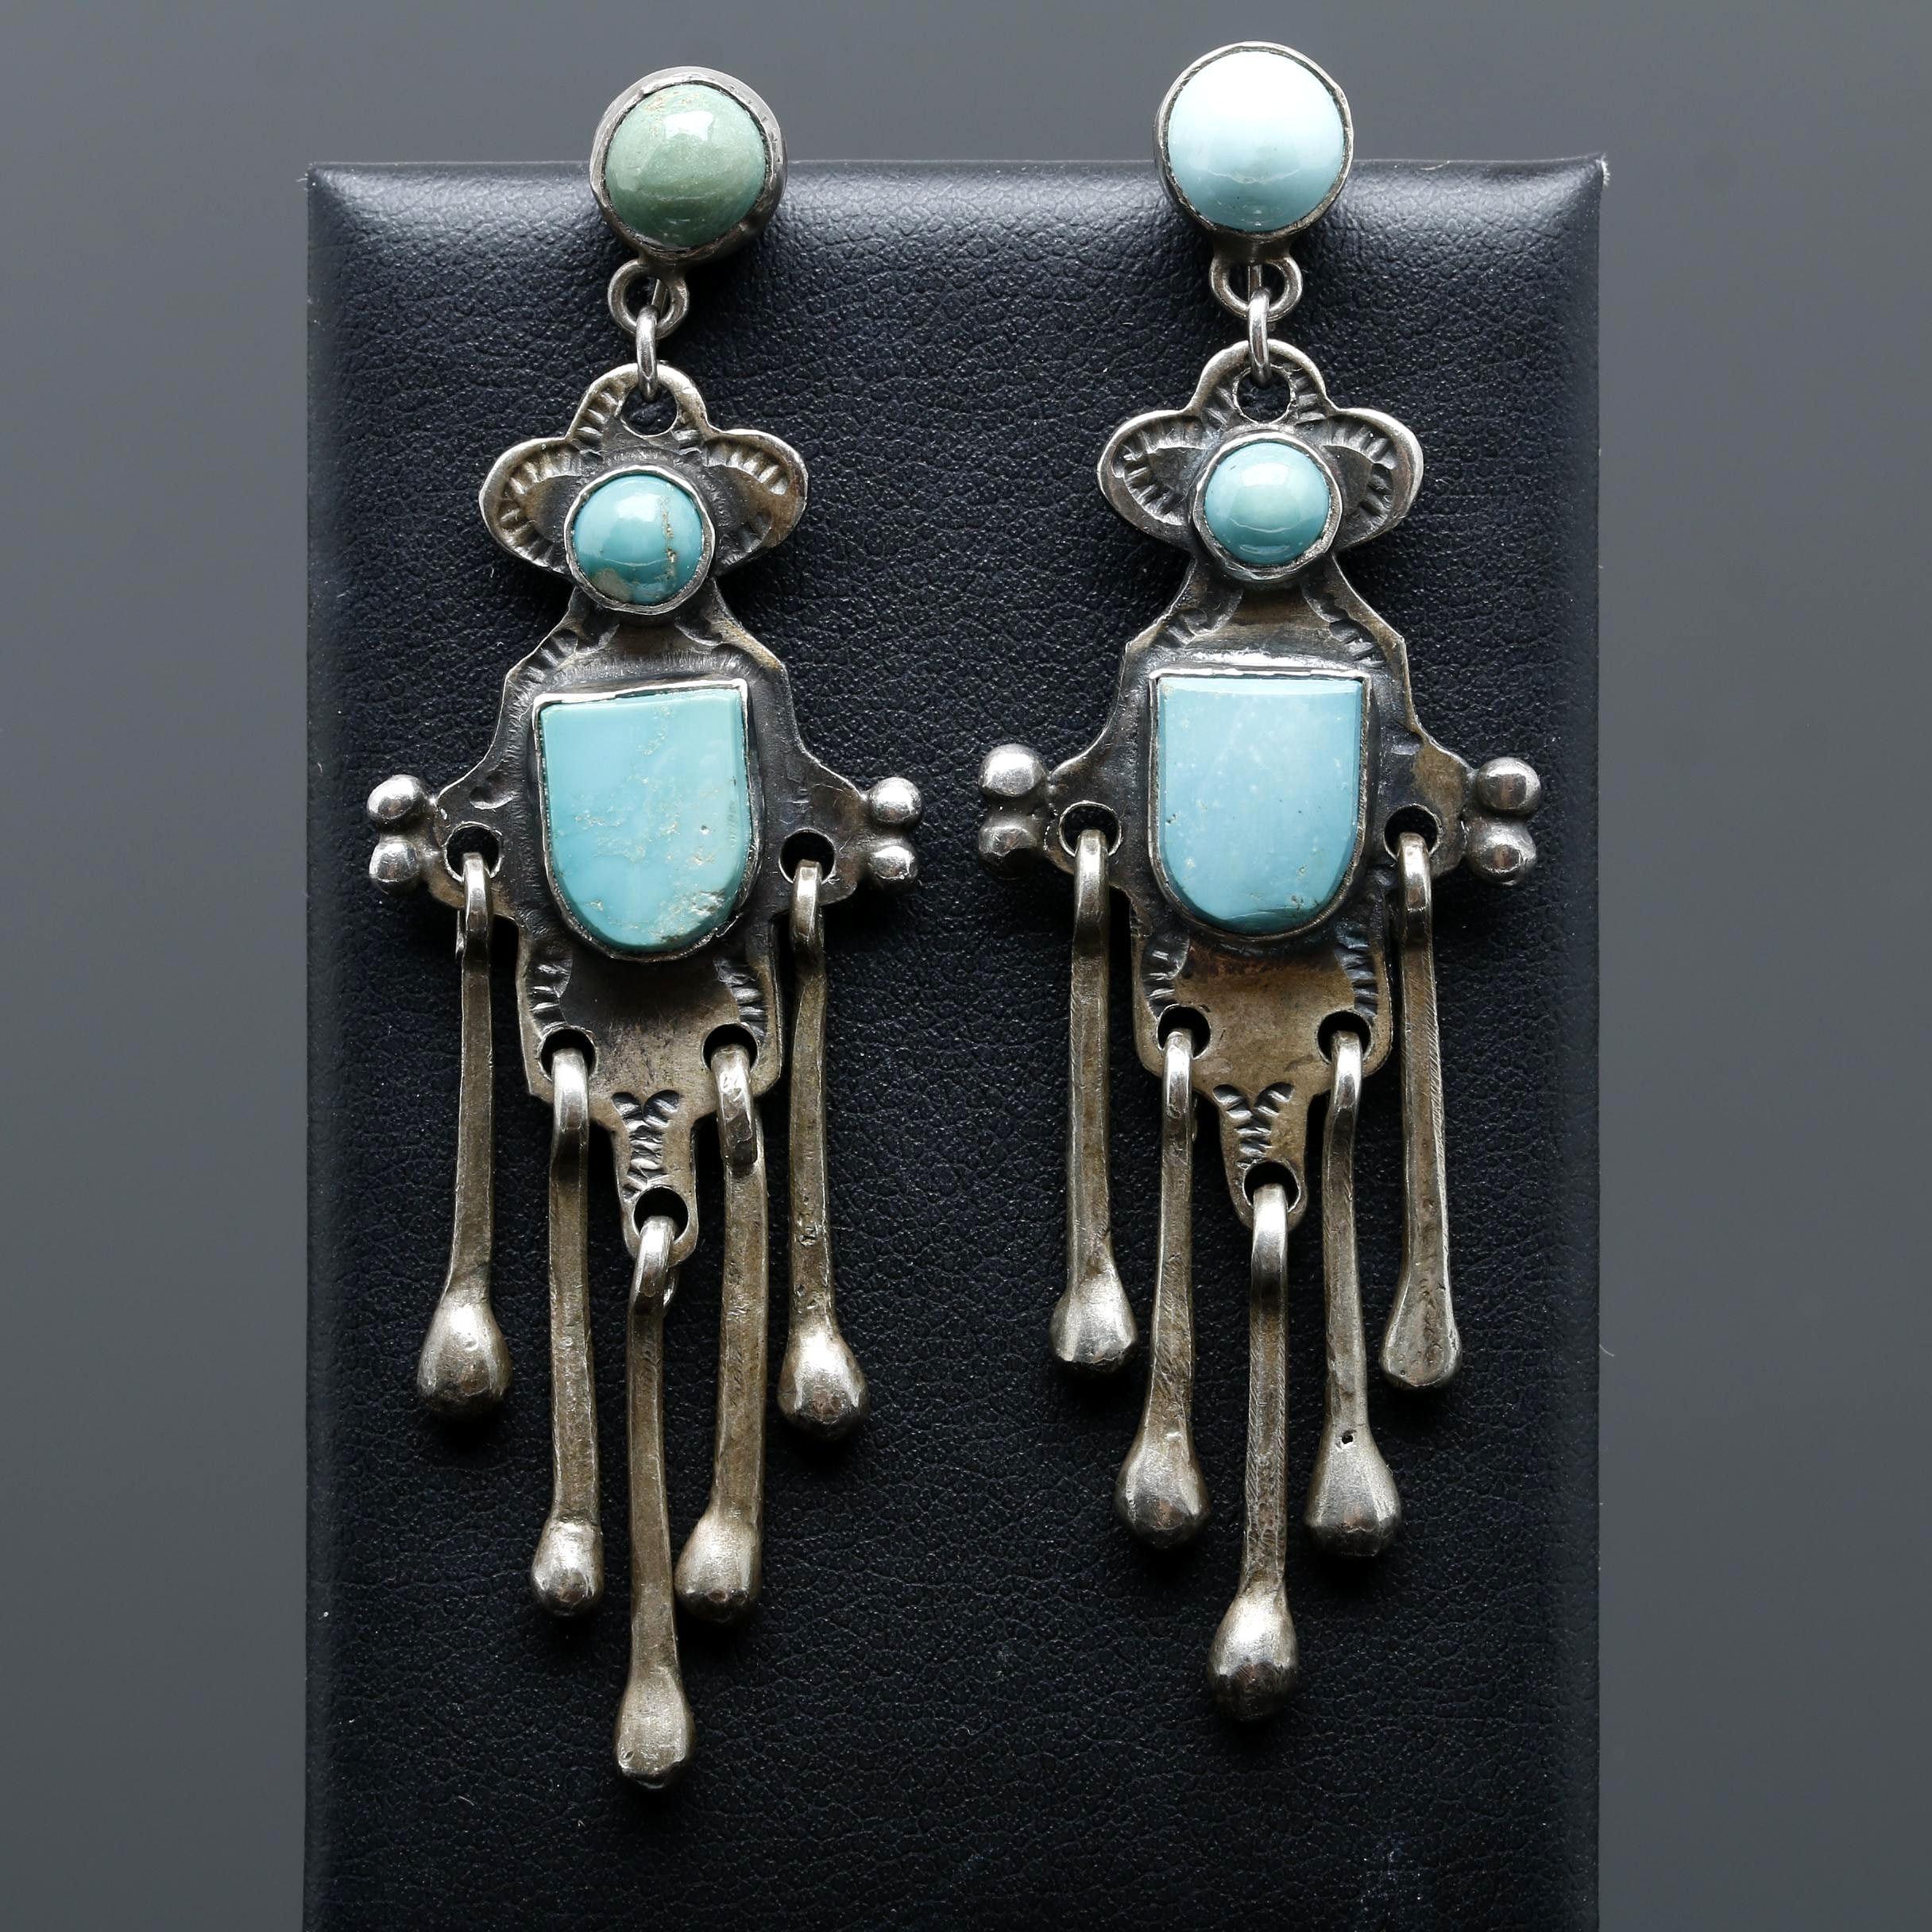 Southwestern Style Sterling Silver Turquoise Drop Earrings